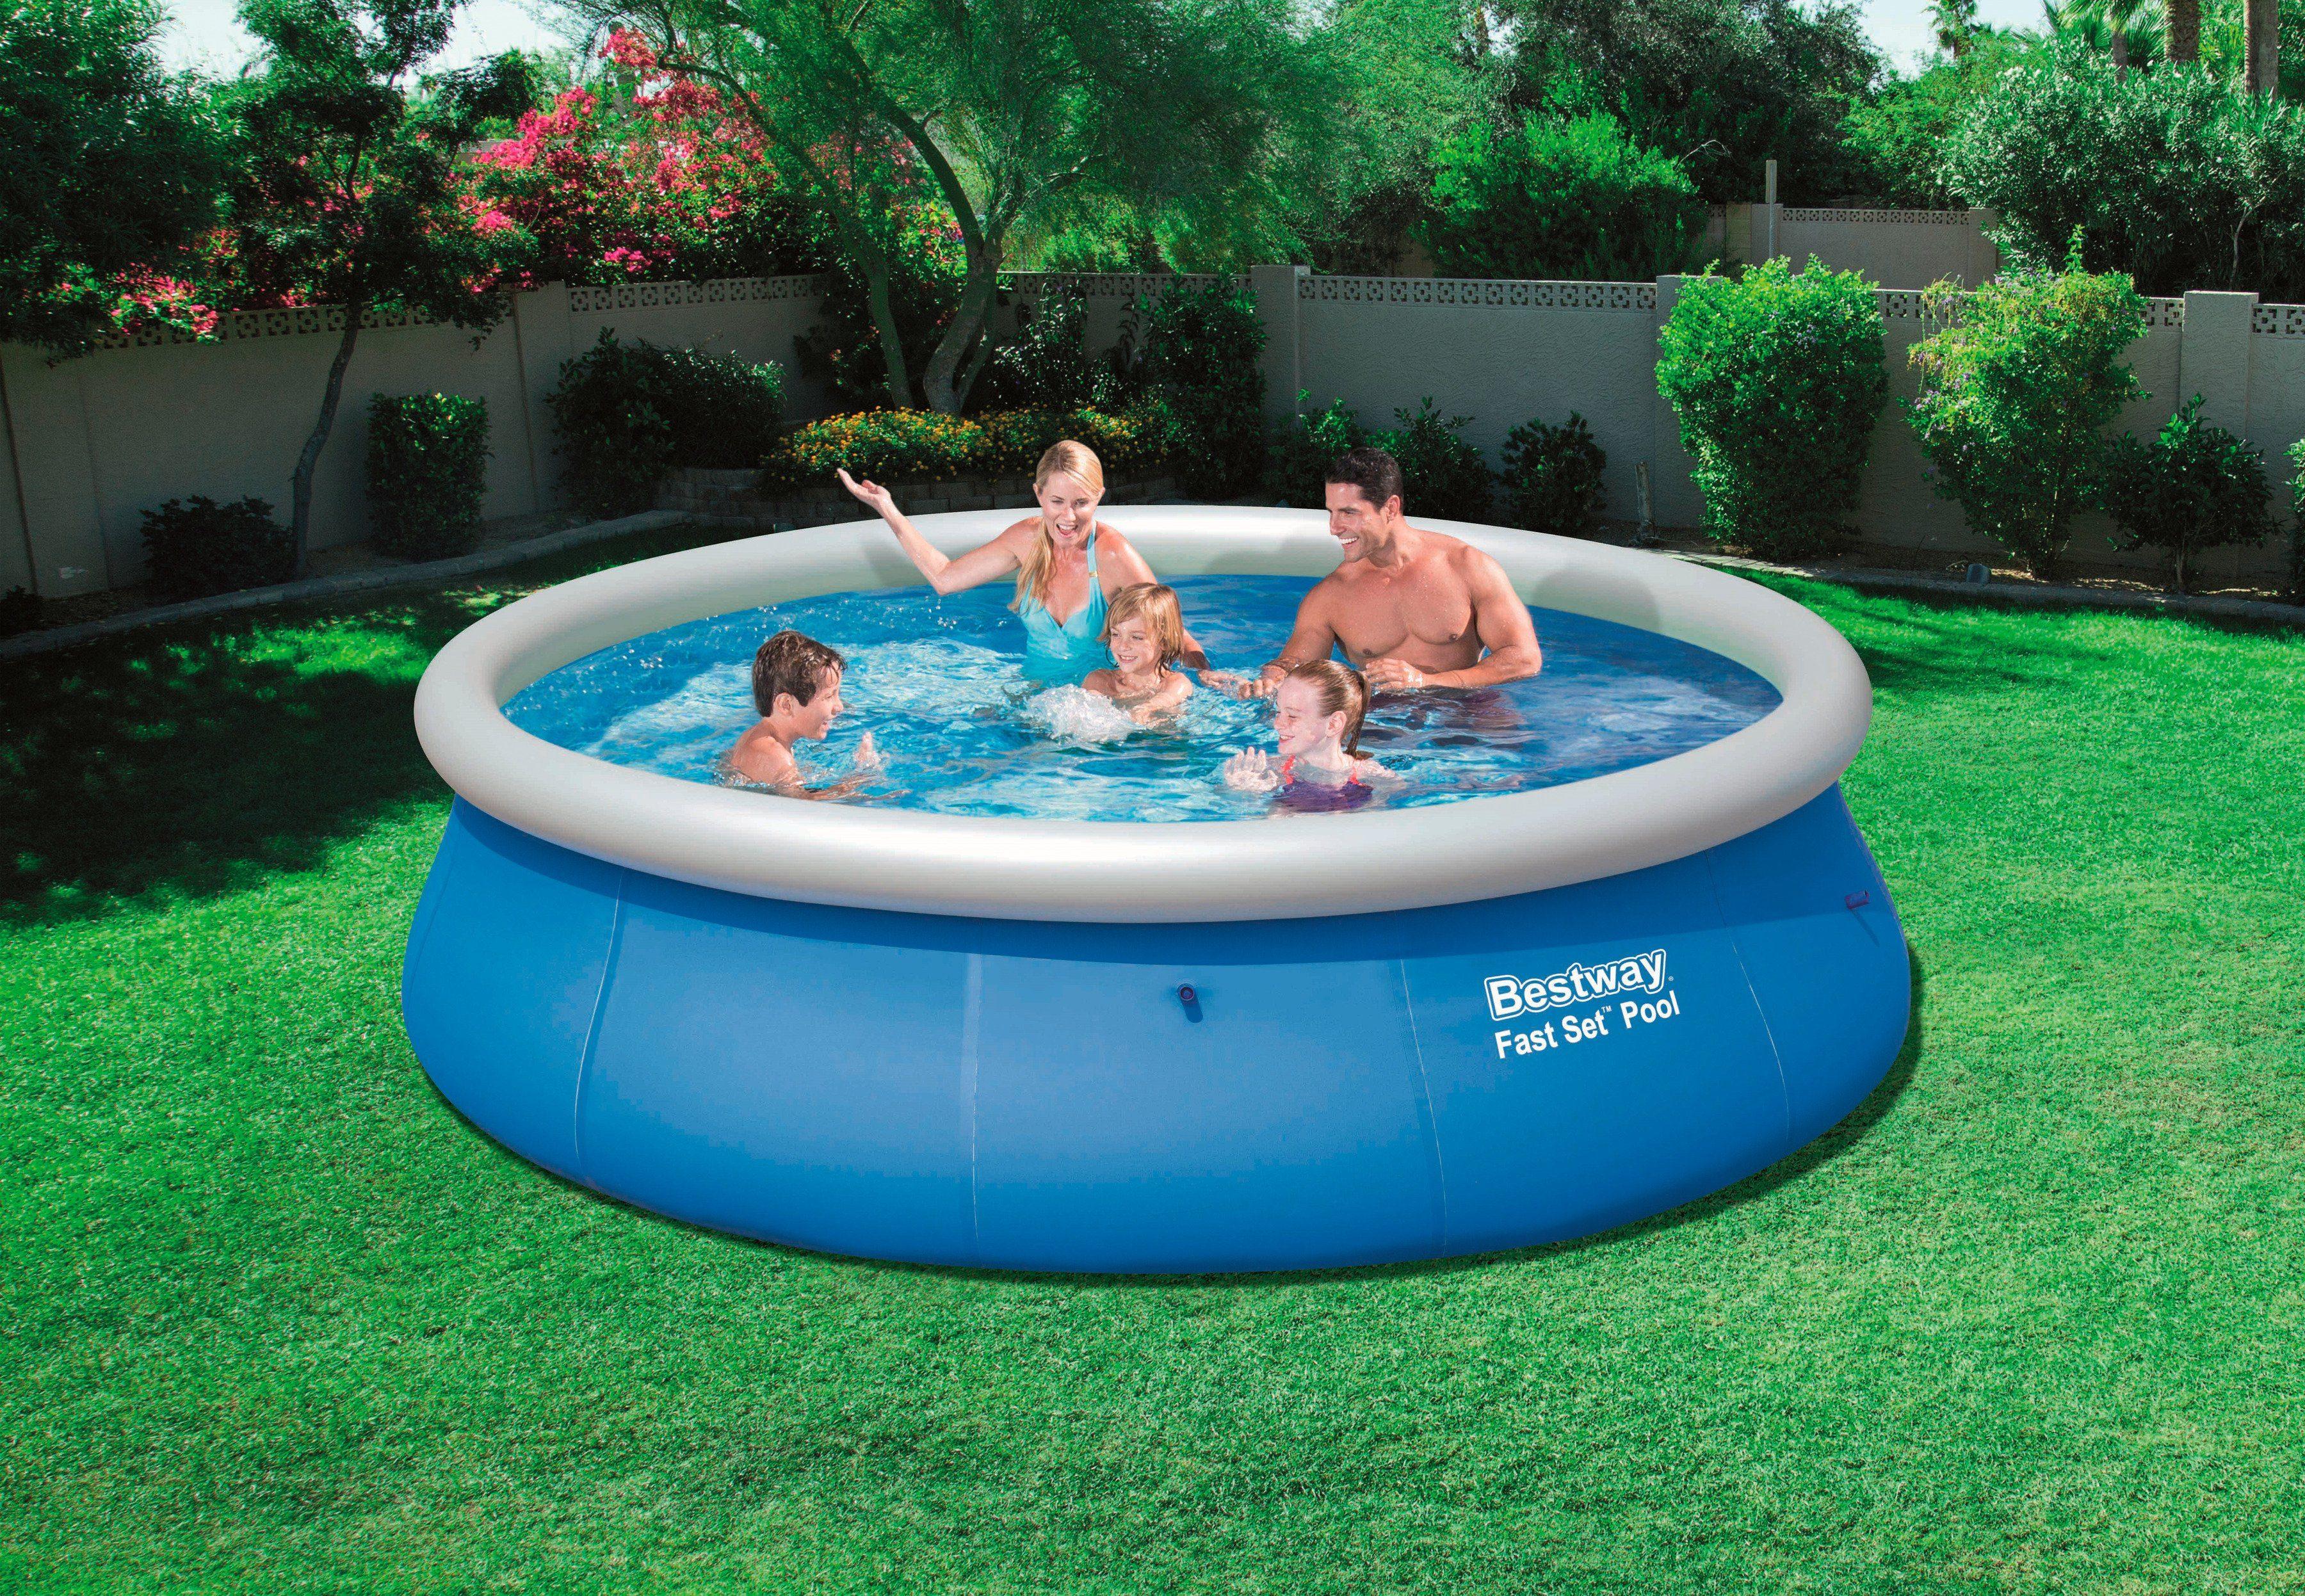 Quick-Up Pool »Fast Set Pool«, ØxH: 396 x 84 cm